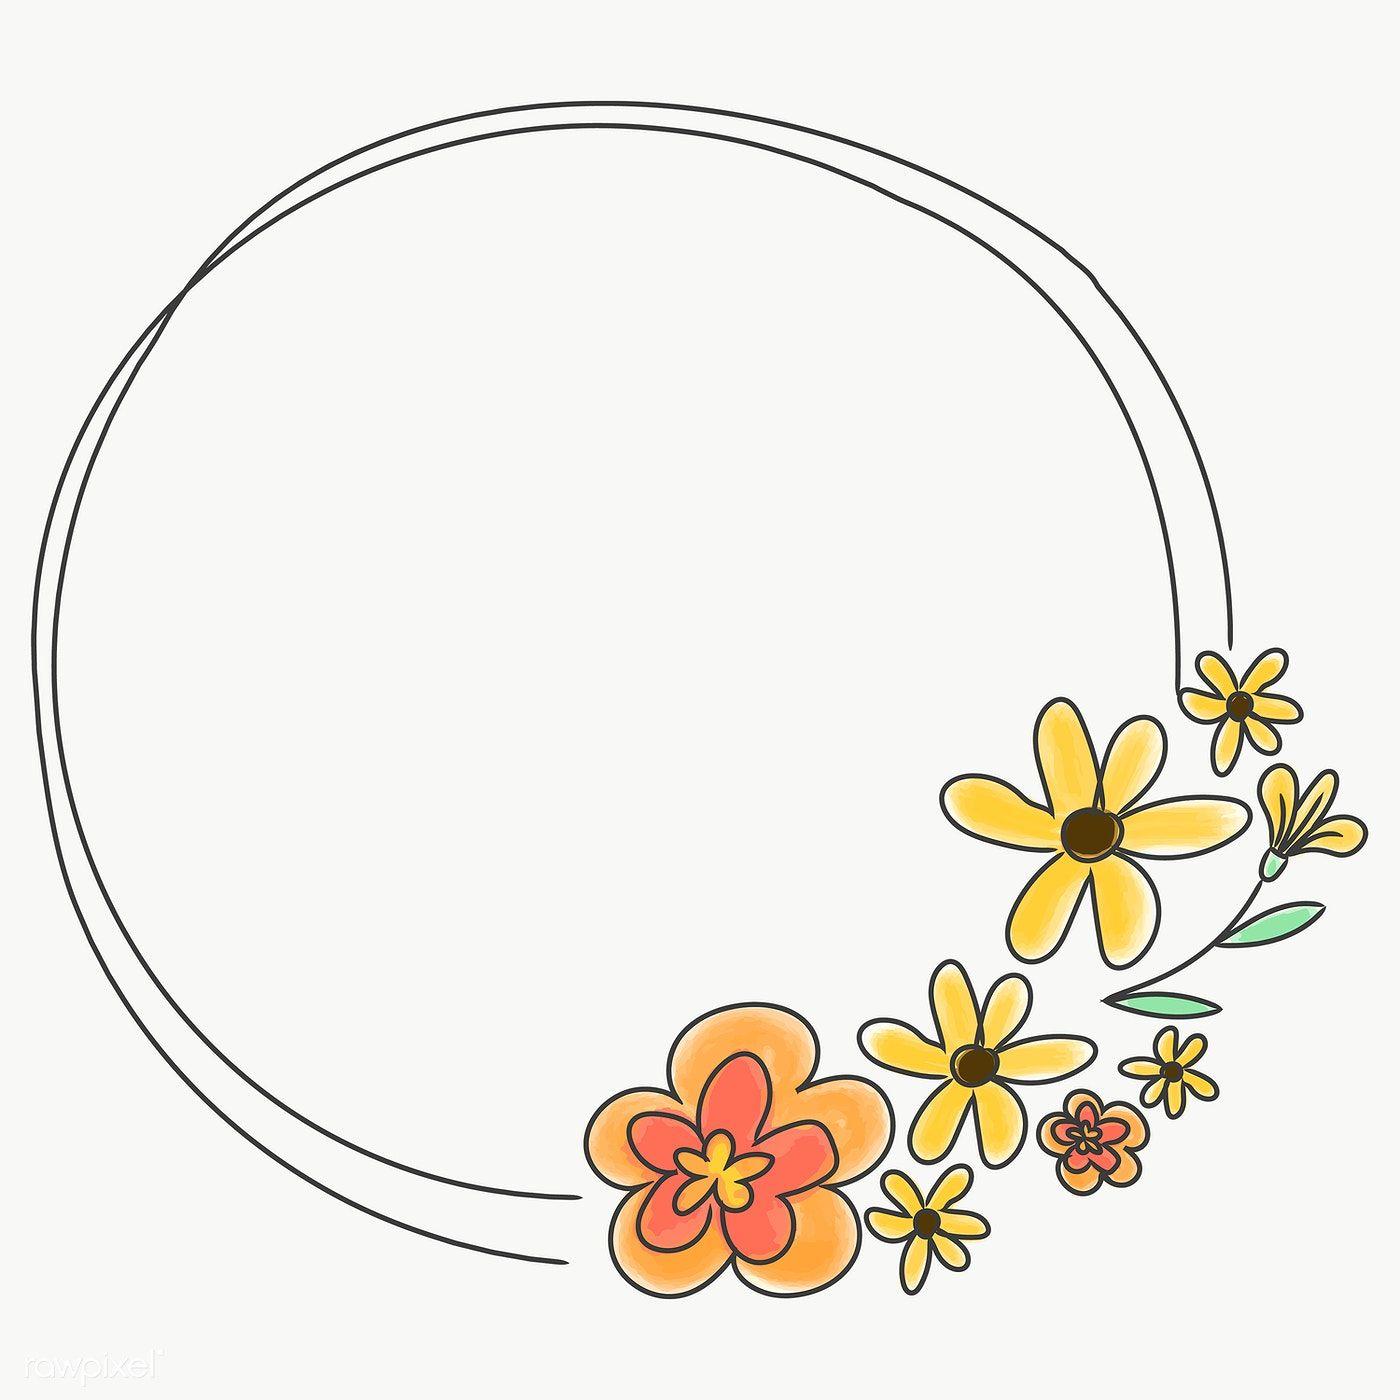 Cute Doodle Floral Wreath Transparent Png Free Image By Rawpixel Com Pimmy Floral Wreaths Illustration Cute Doodles Floral Doodle